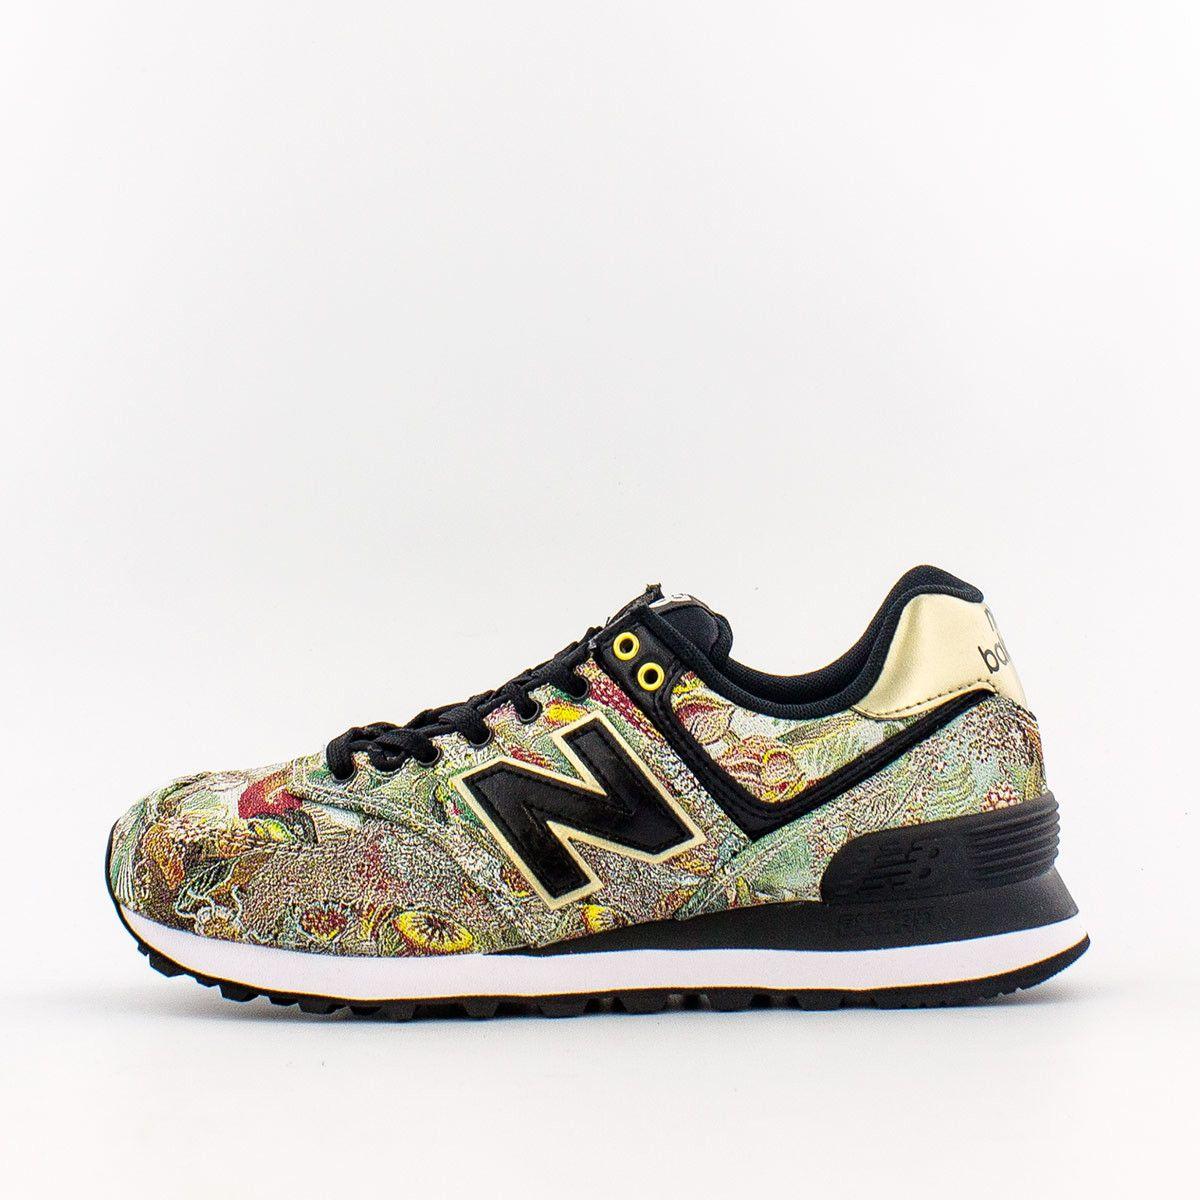 New Balance 574 Sweet Nectar | New